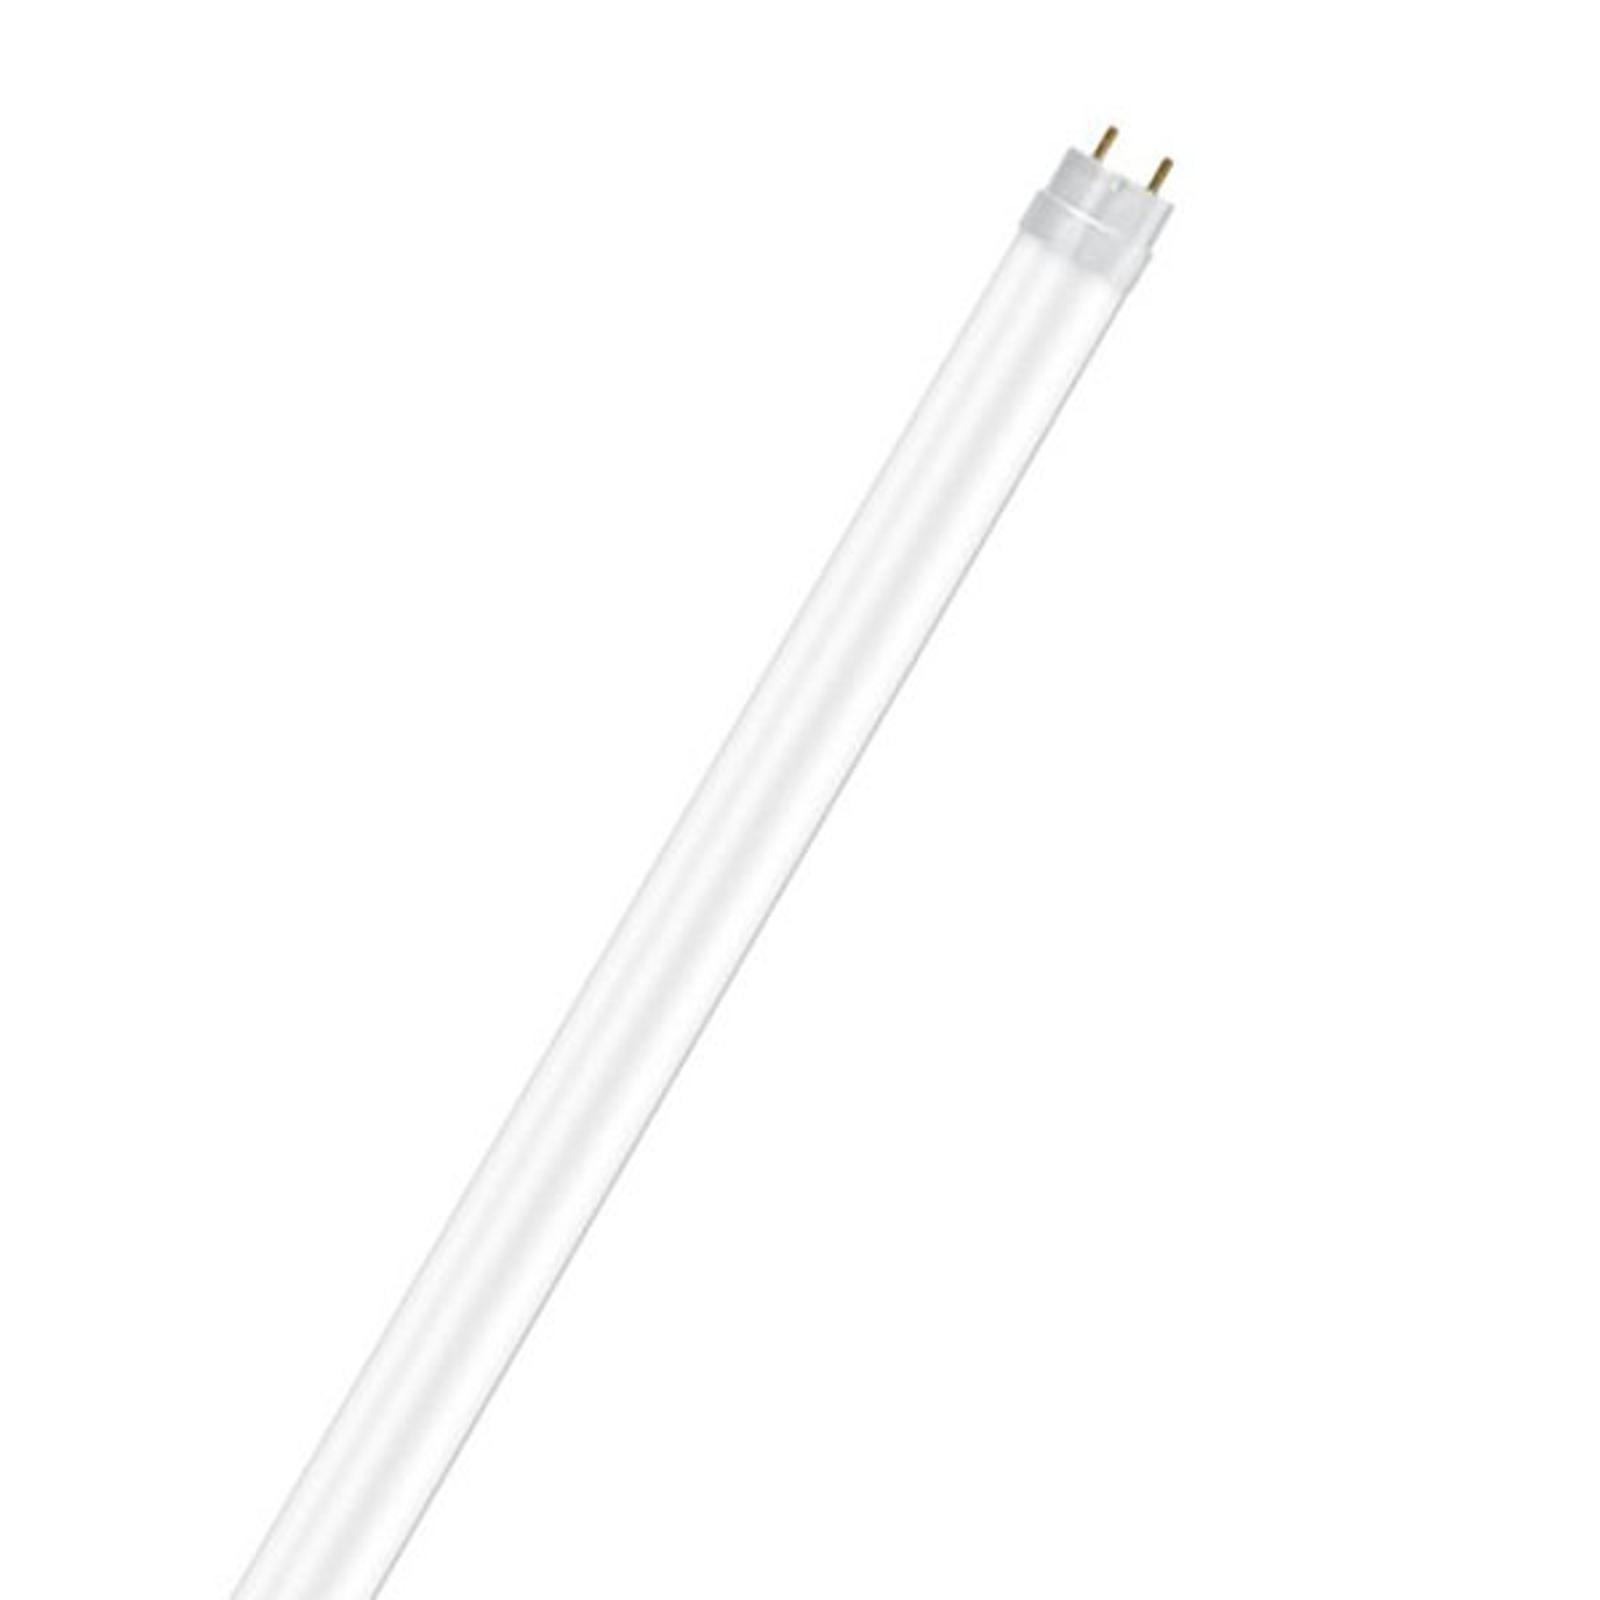 OSRAM-LED-putki G13 T8 60cm SubstiTUBE 6,6W 3 000K